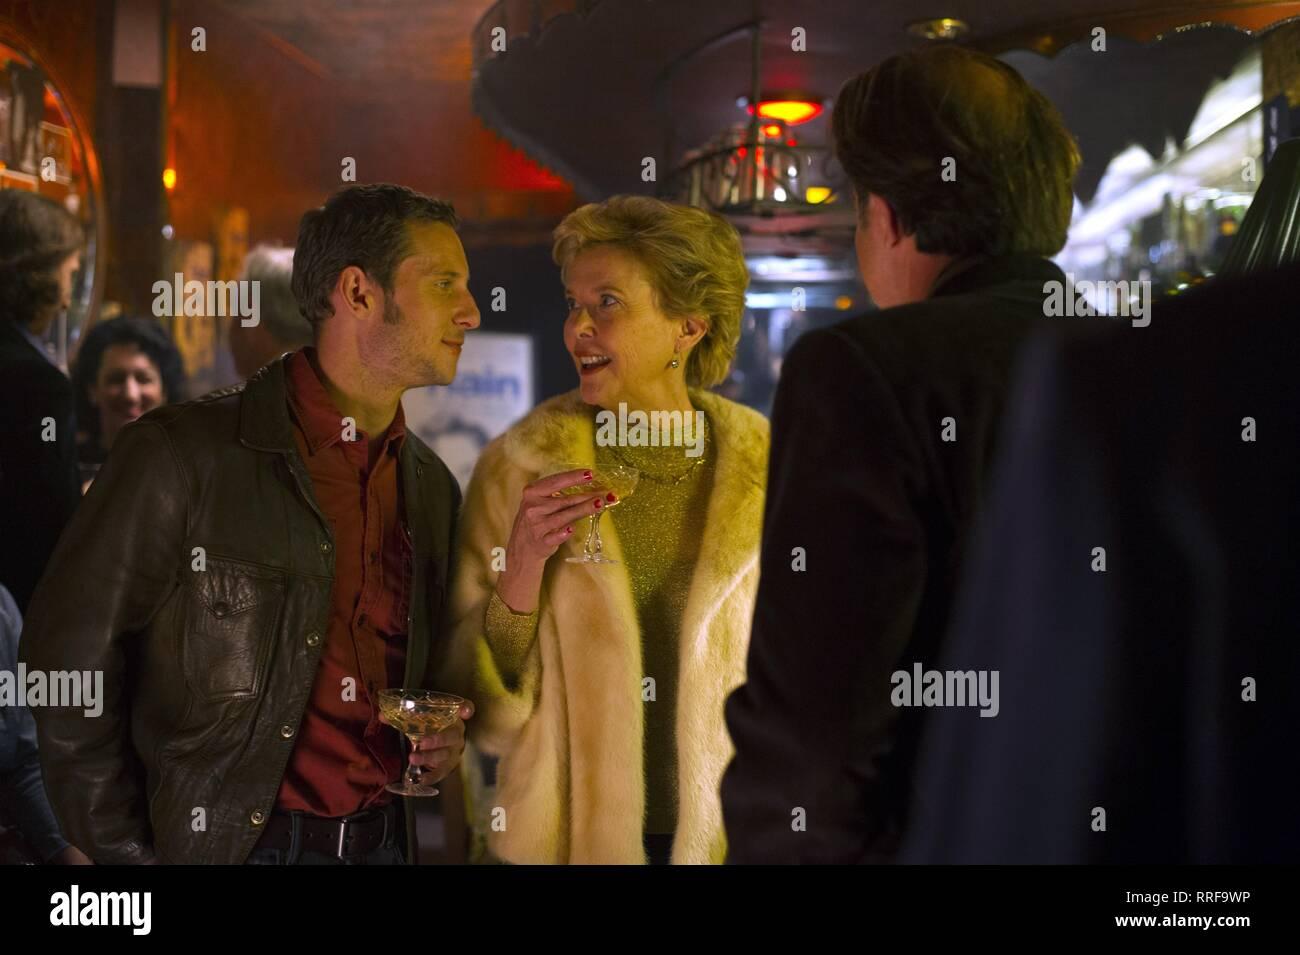 FILM STARS DON'T DIE IN LIVERPOOL, JAMIE BELL , ANNETTE BENING, 2017 - Stock Image